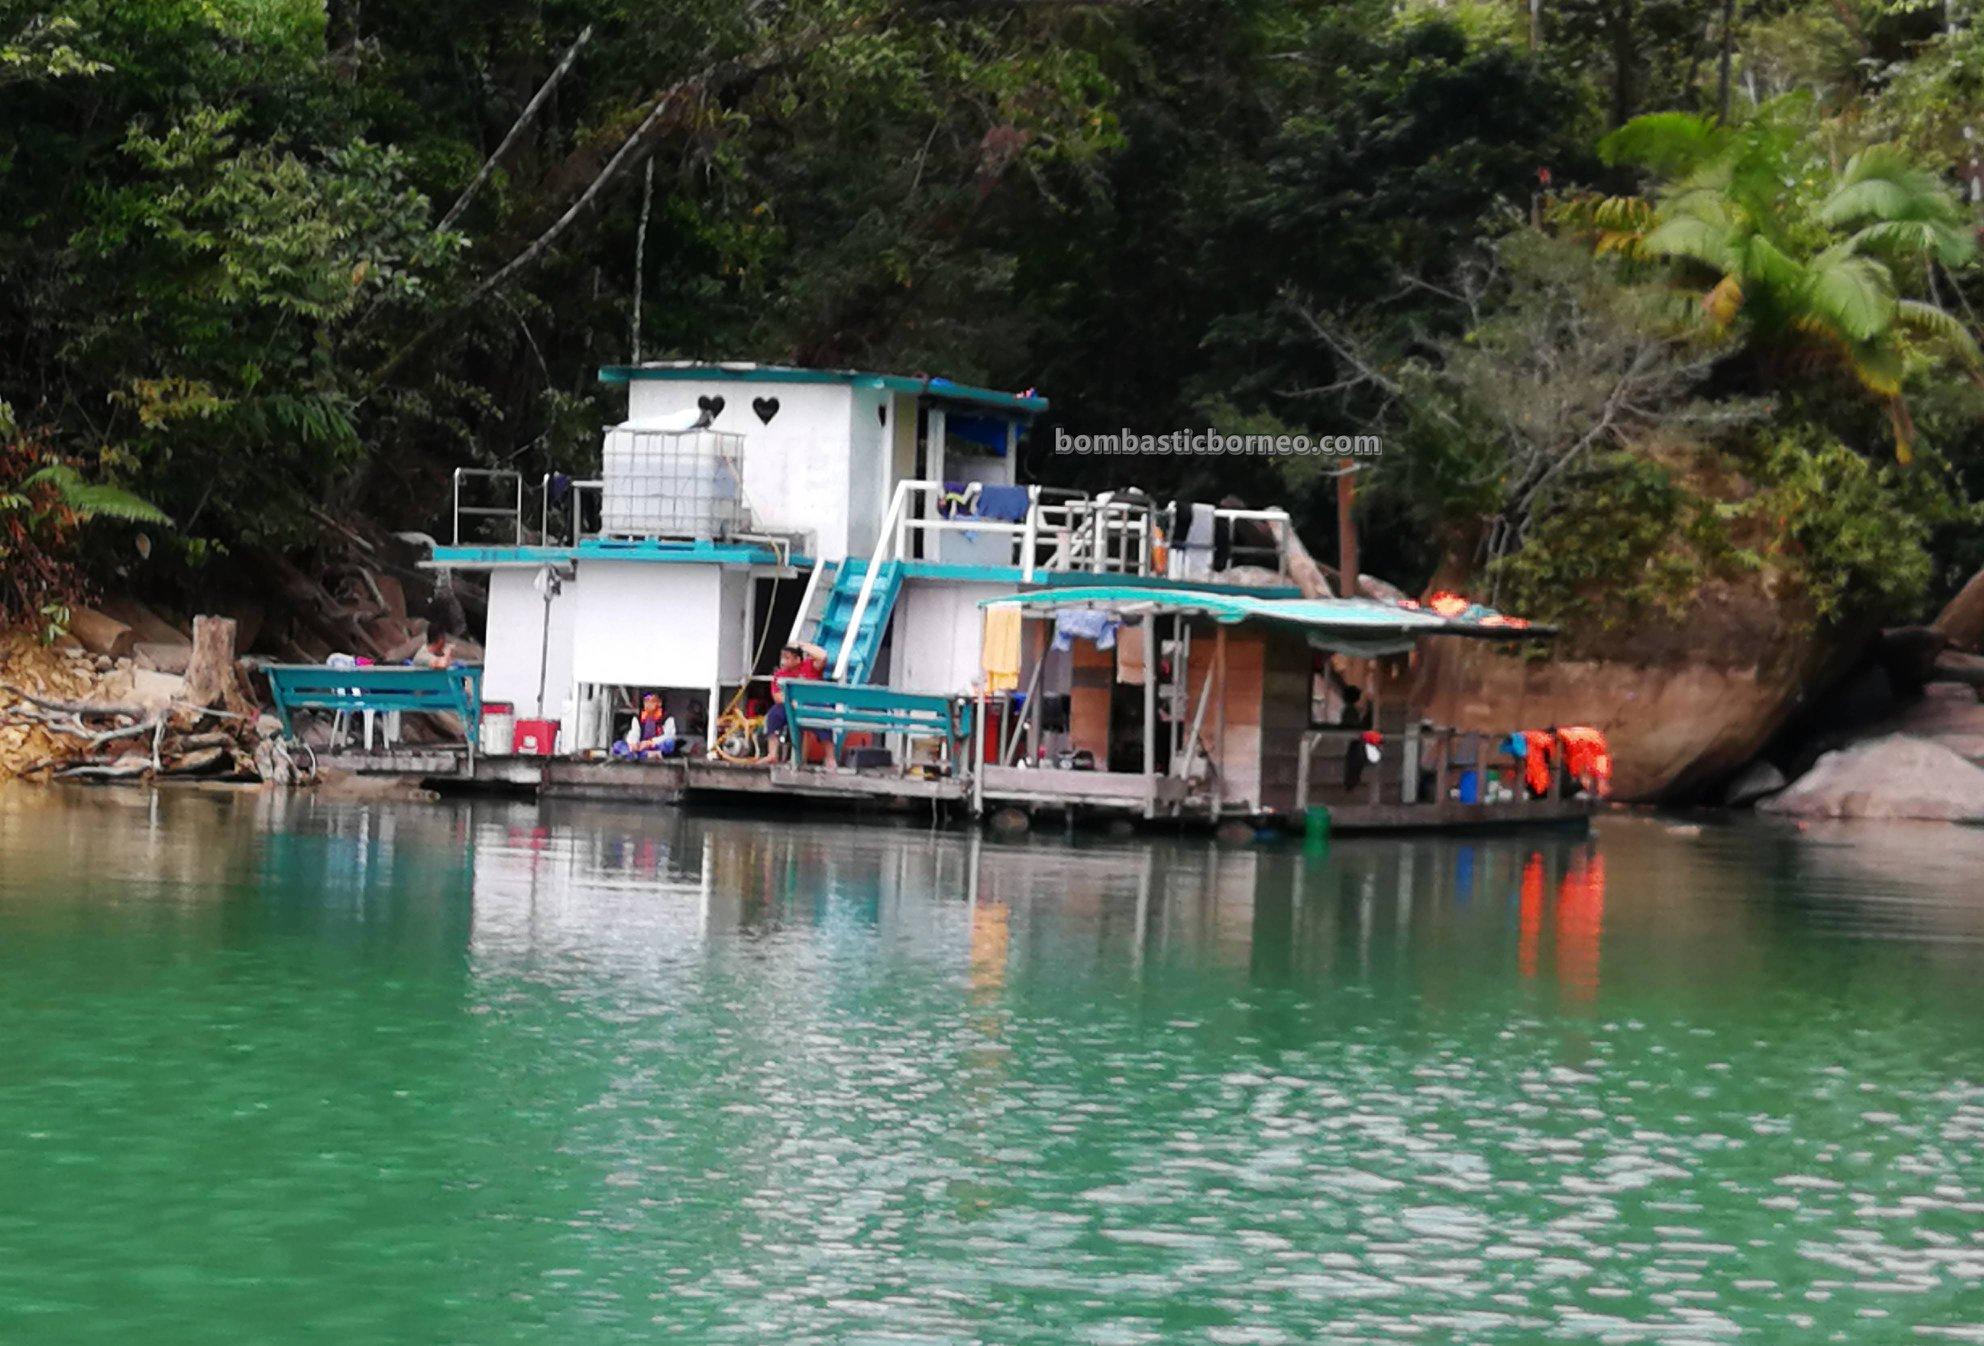 Bakun Hydroelectric Power Dam, empangan, floating house, rumah terapung, fishing trip, memancing ikan, Belaga, Kapit, Malaysia, Tourism, tourist attraction, travel guide, Borneo, Sarawak, 马来西亚钓鱼之旅